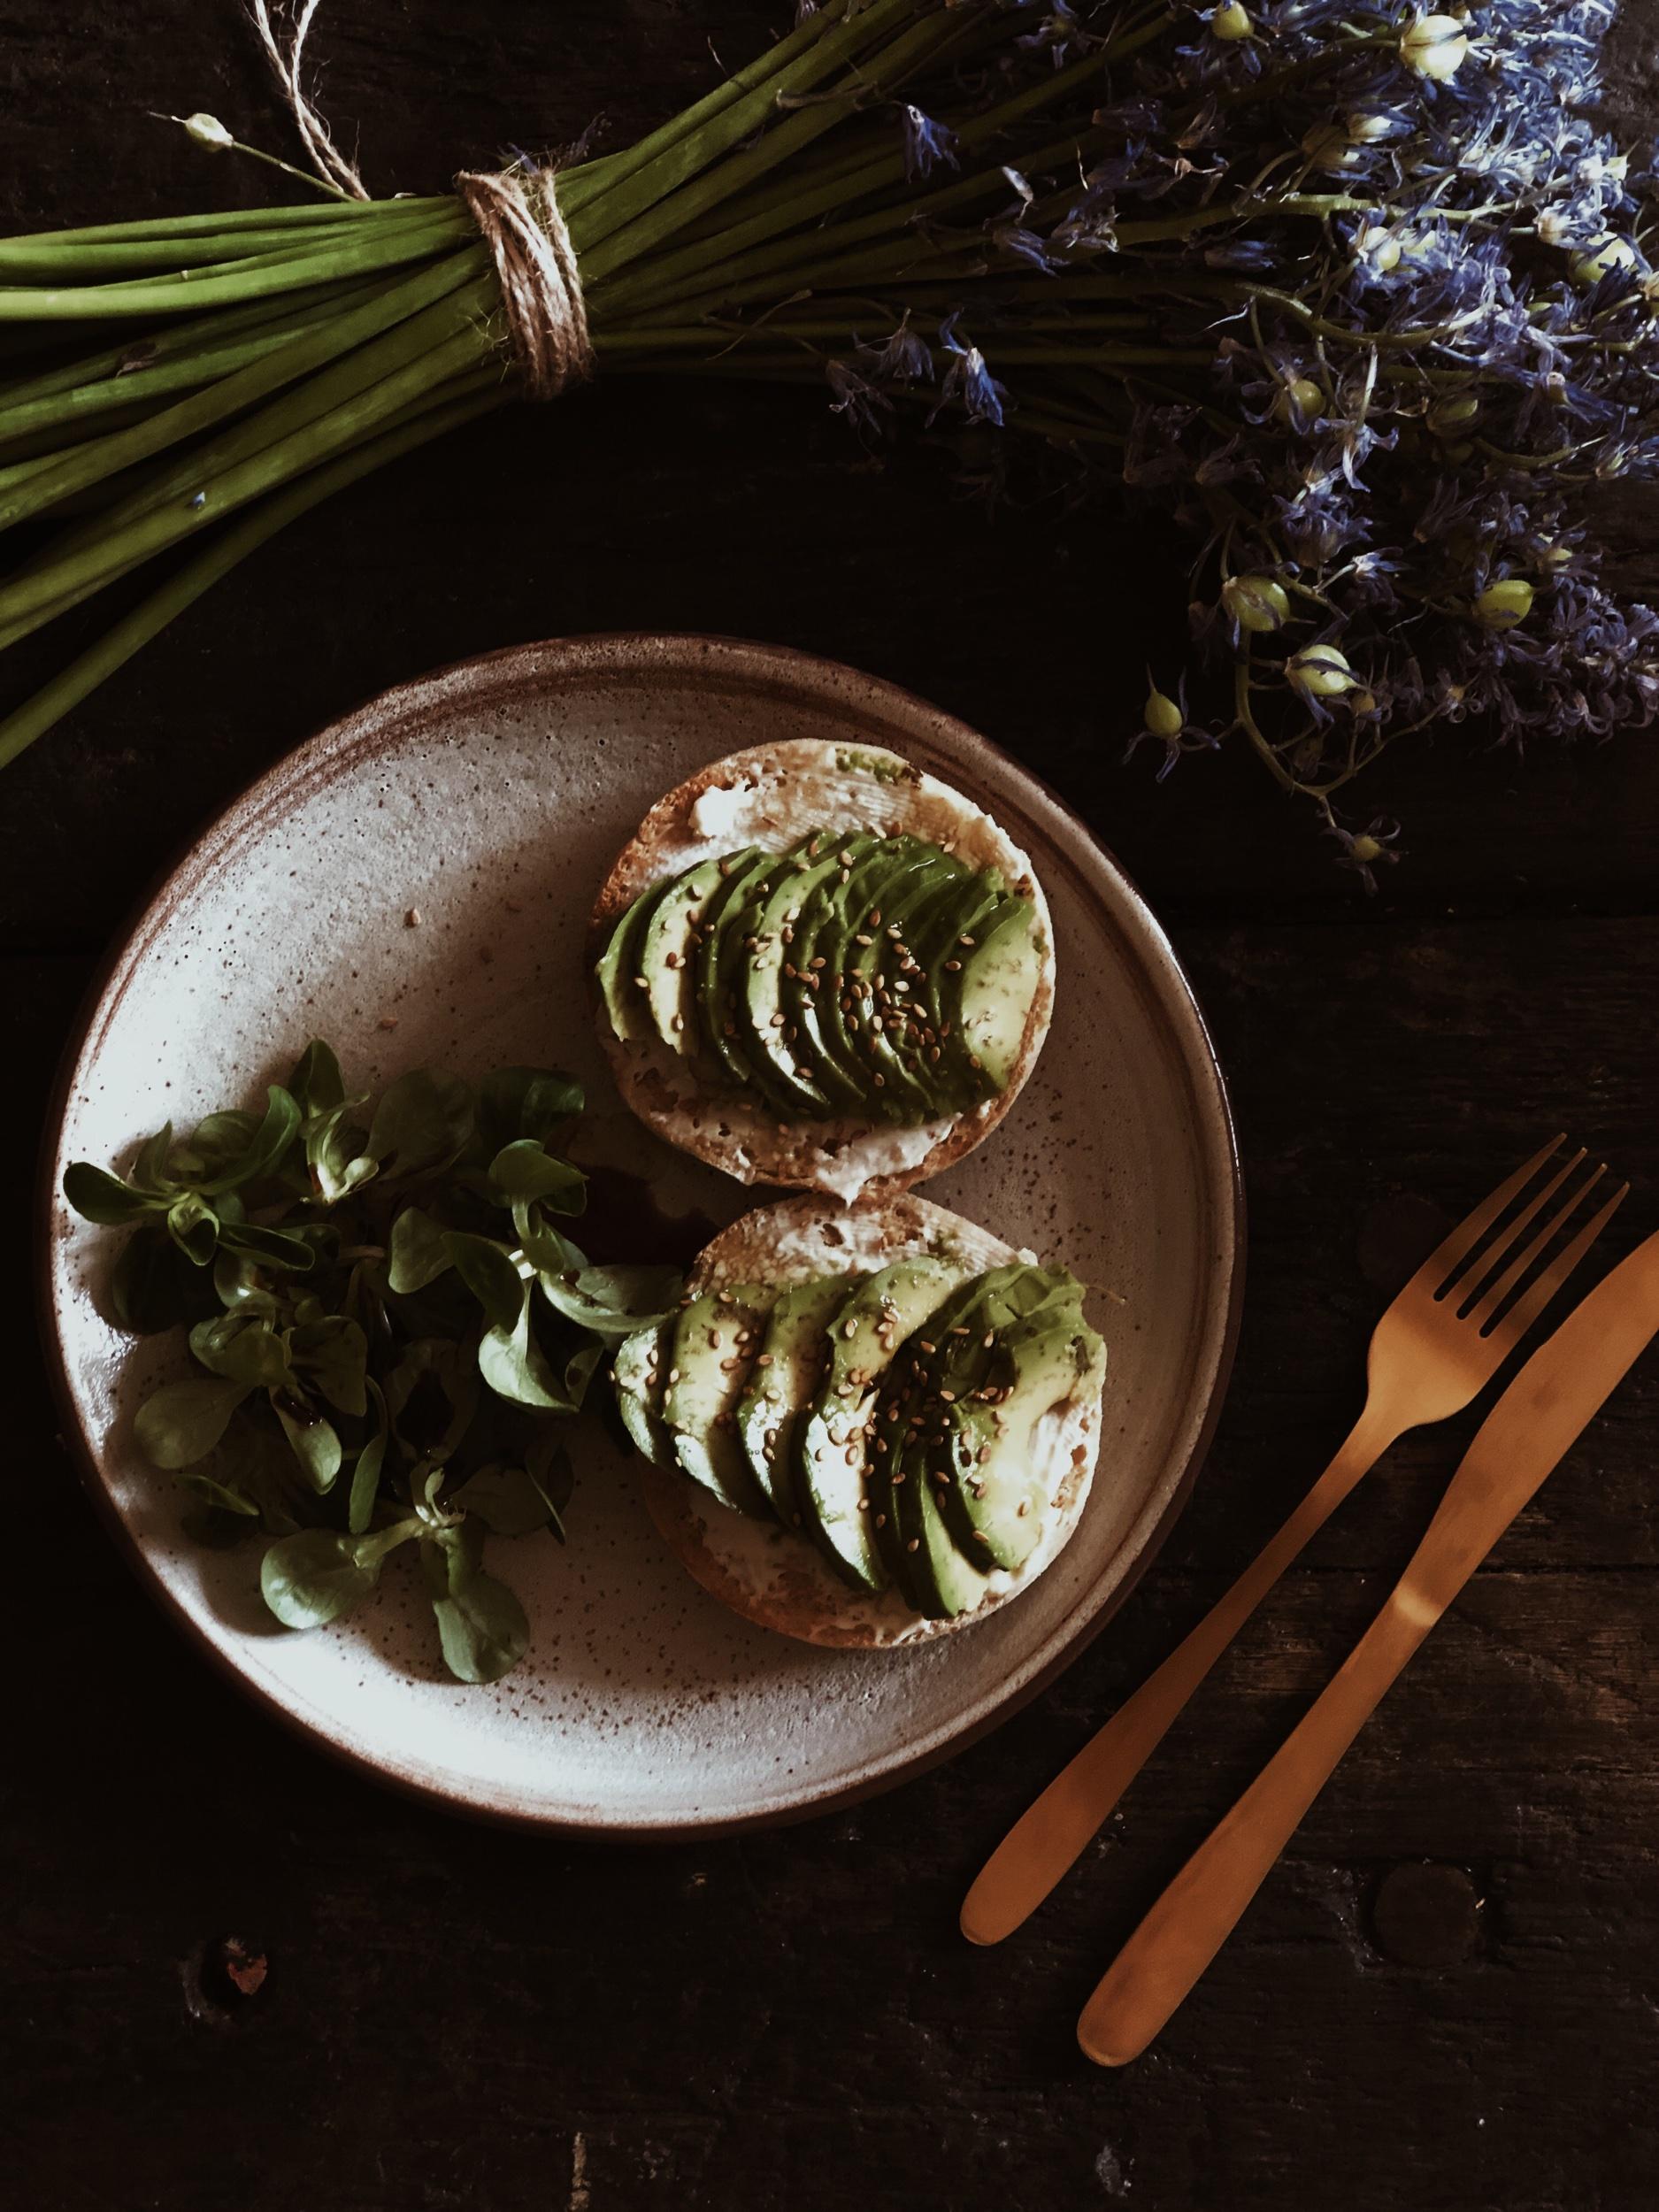 Carnet Sauvage - Blog mode, lifestyle, direction artistique et arts visuels Lille - Avocado toasts